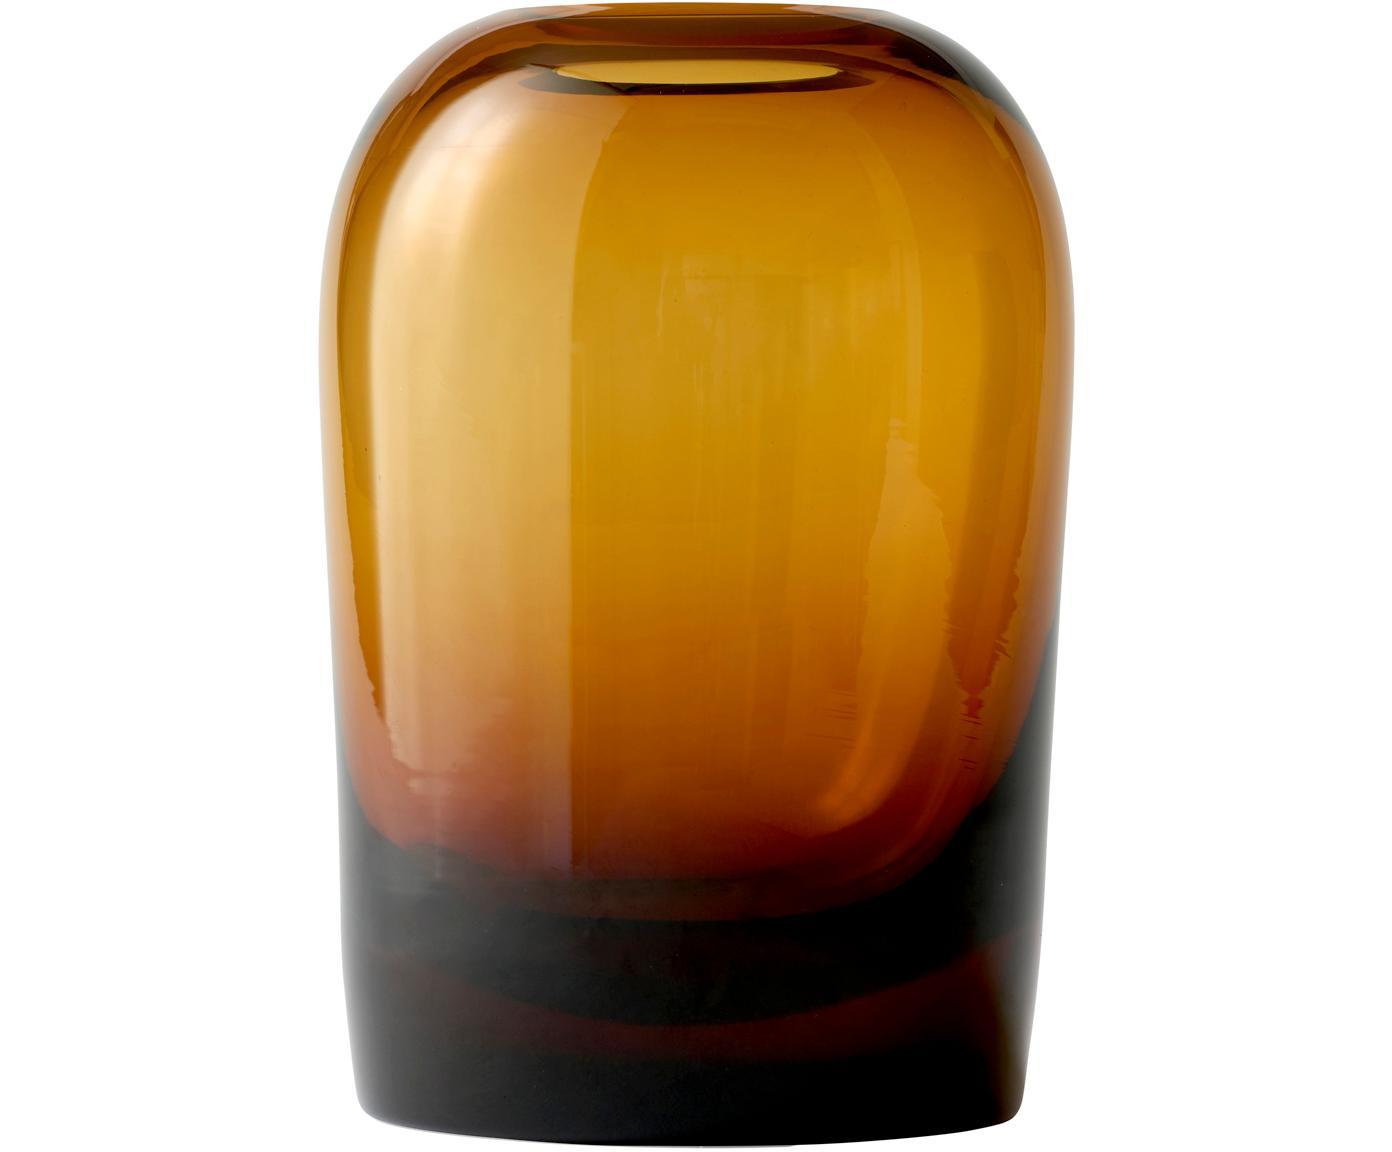 Mundgeblasene Vase Troll, Glas, mundgeblasen, Bernsteinfarben, Ø 13 cm